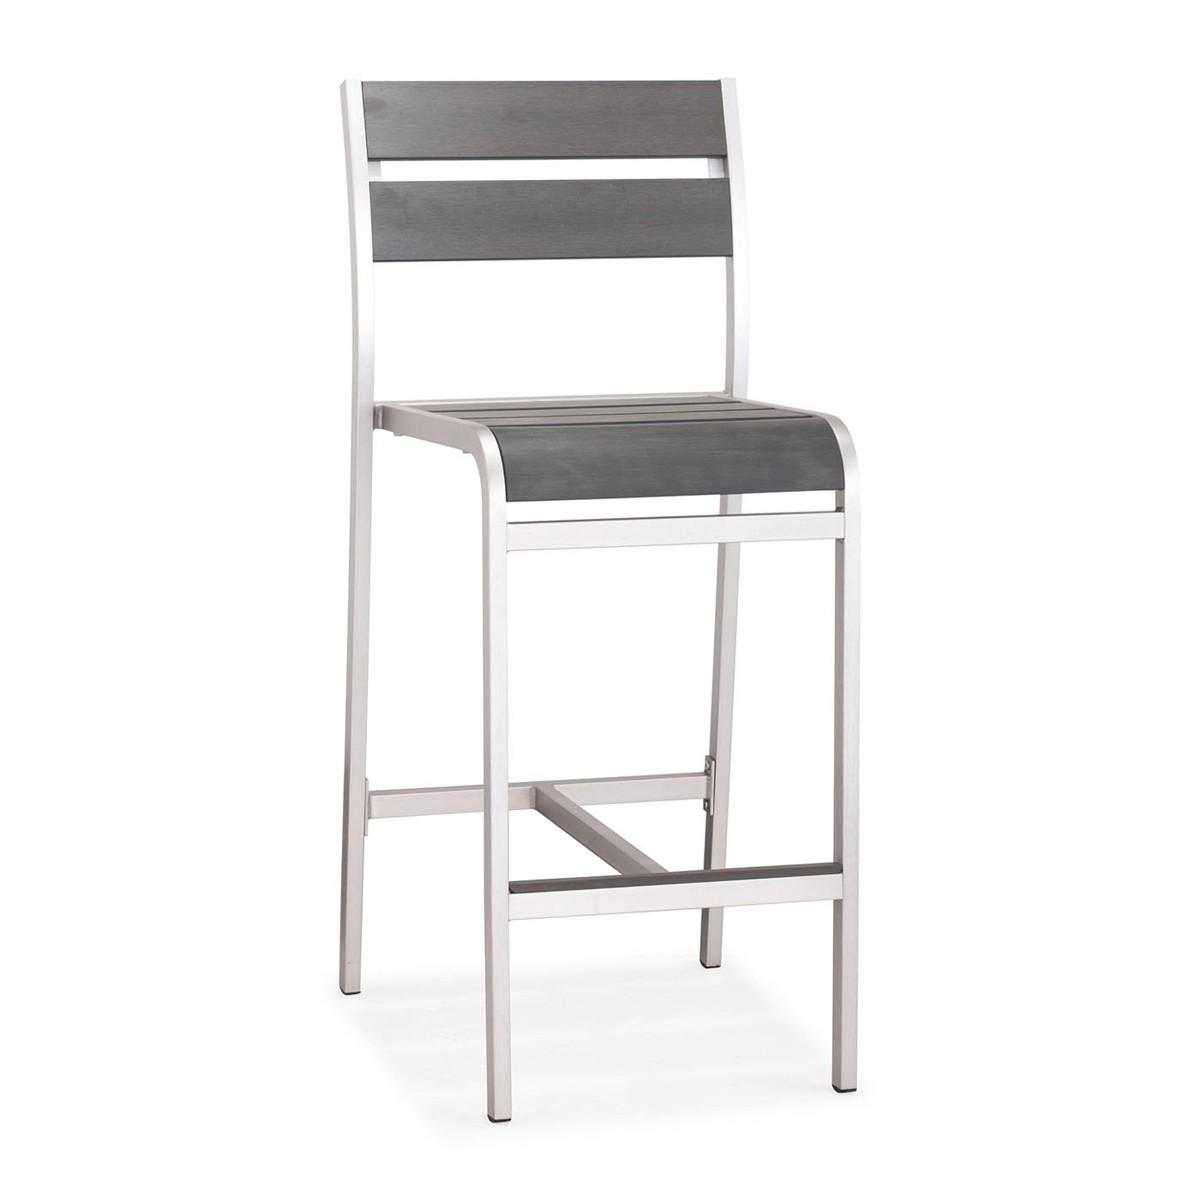 Zuo Modern Megapolis Bar Armless Chair - Brushed Aluminum